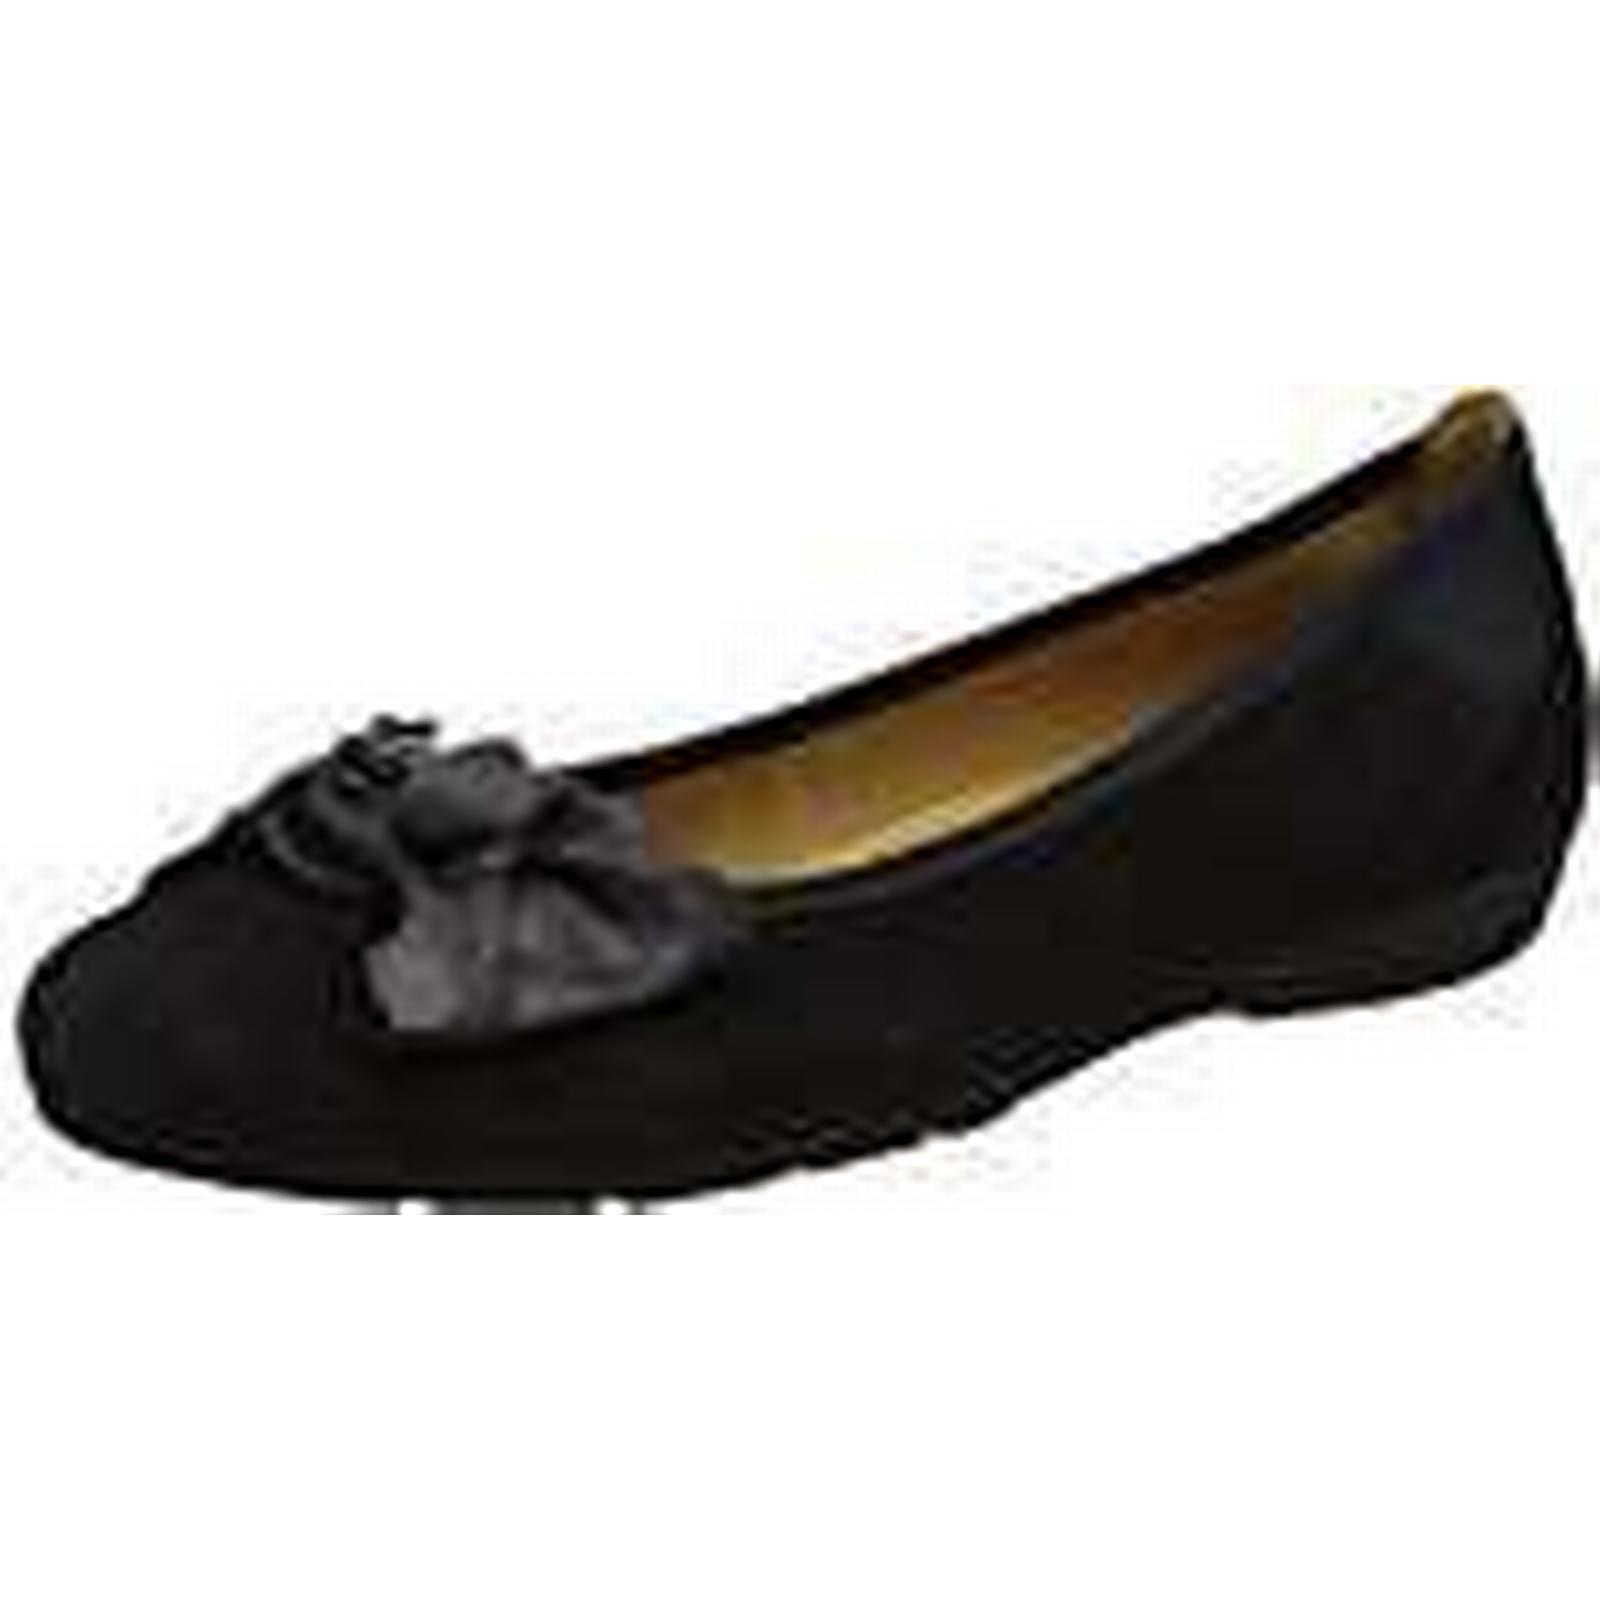 Gabor Shoes Women''s Casual Ballet Flats, UK Blue (16 Pazifik/River), 5 UK Flats, 5 UK ace0ee